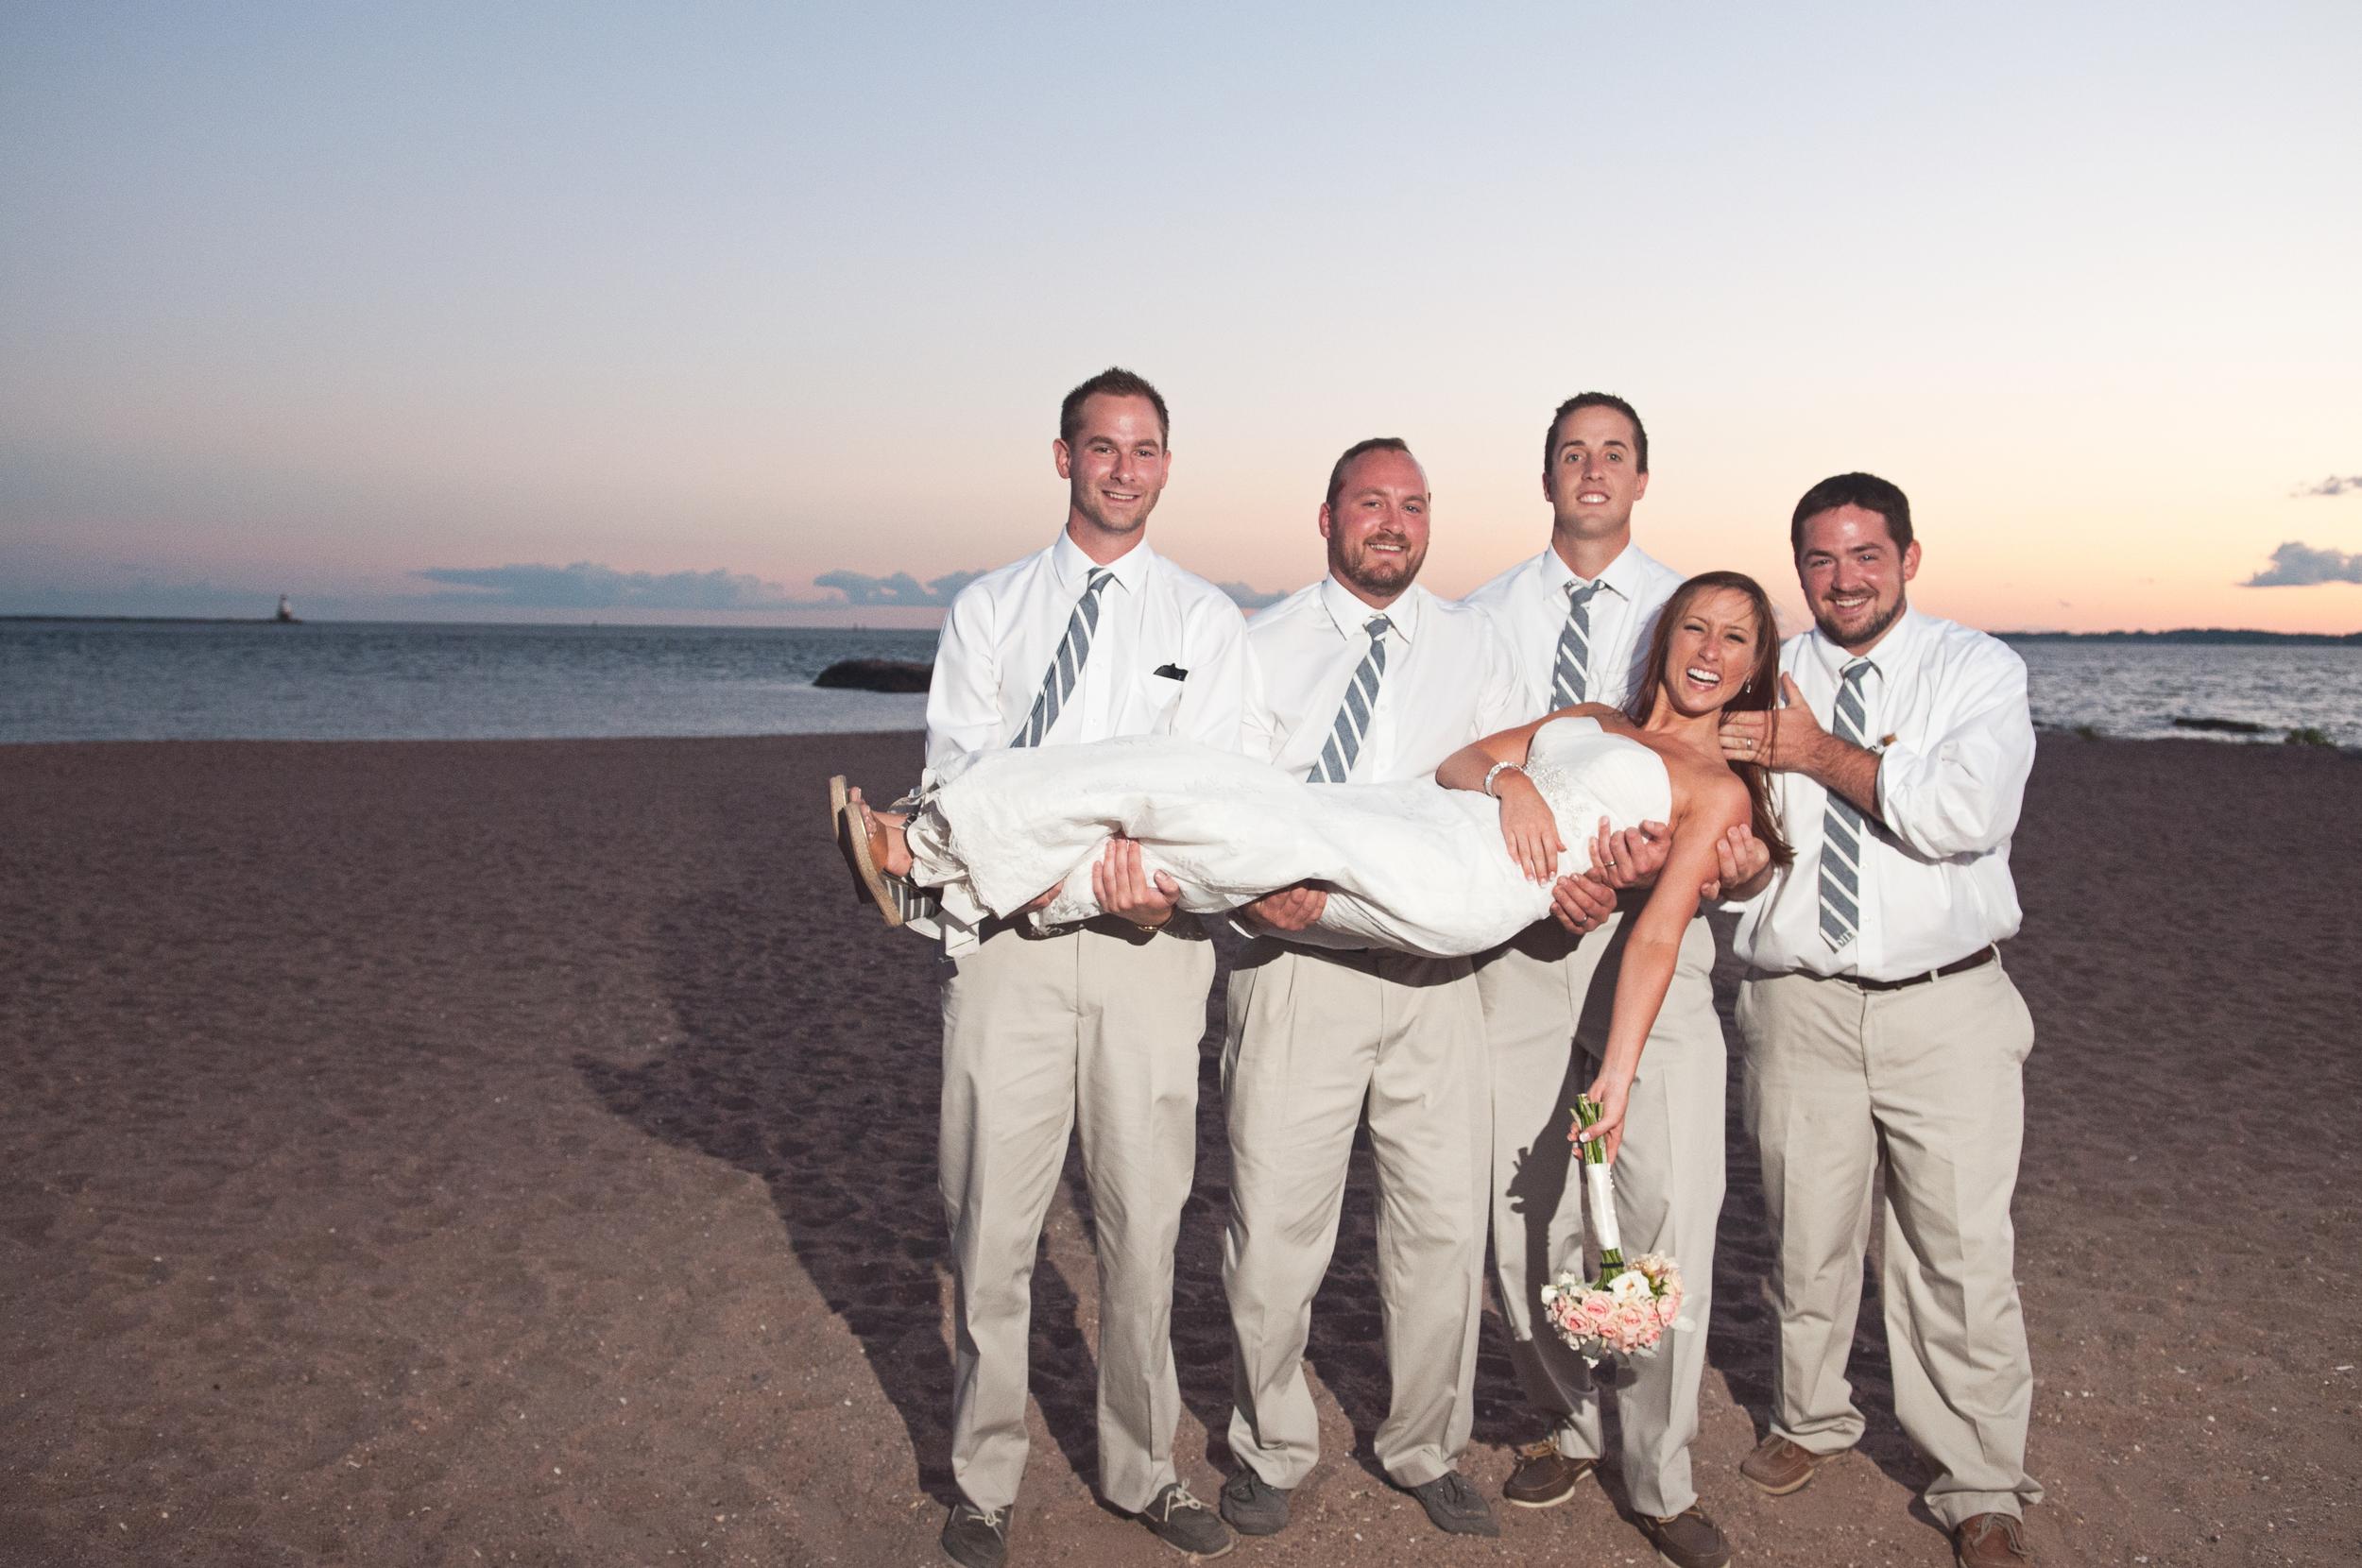 Angela_Chicoski_CT_wedding_photographer_075.jpg